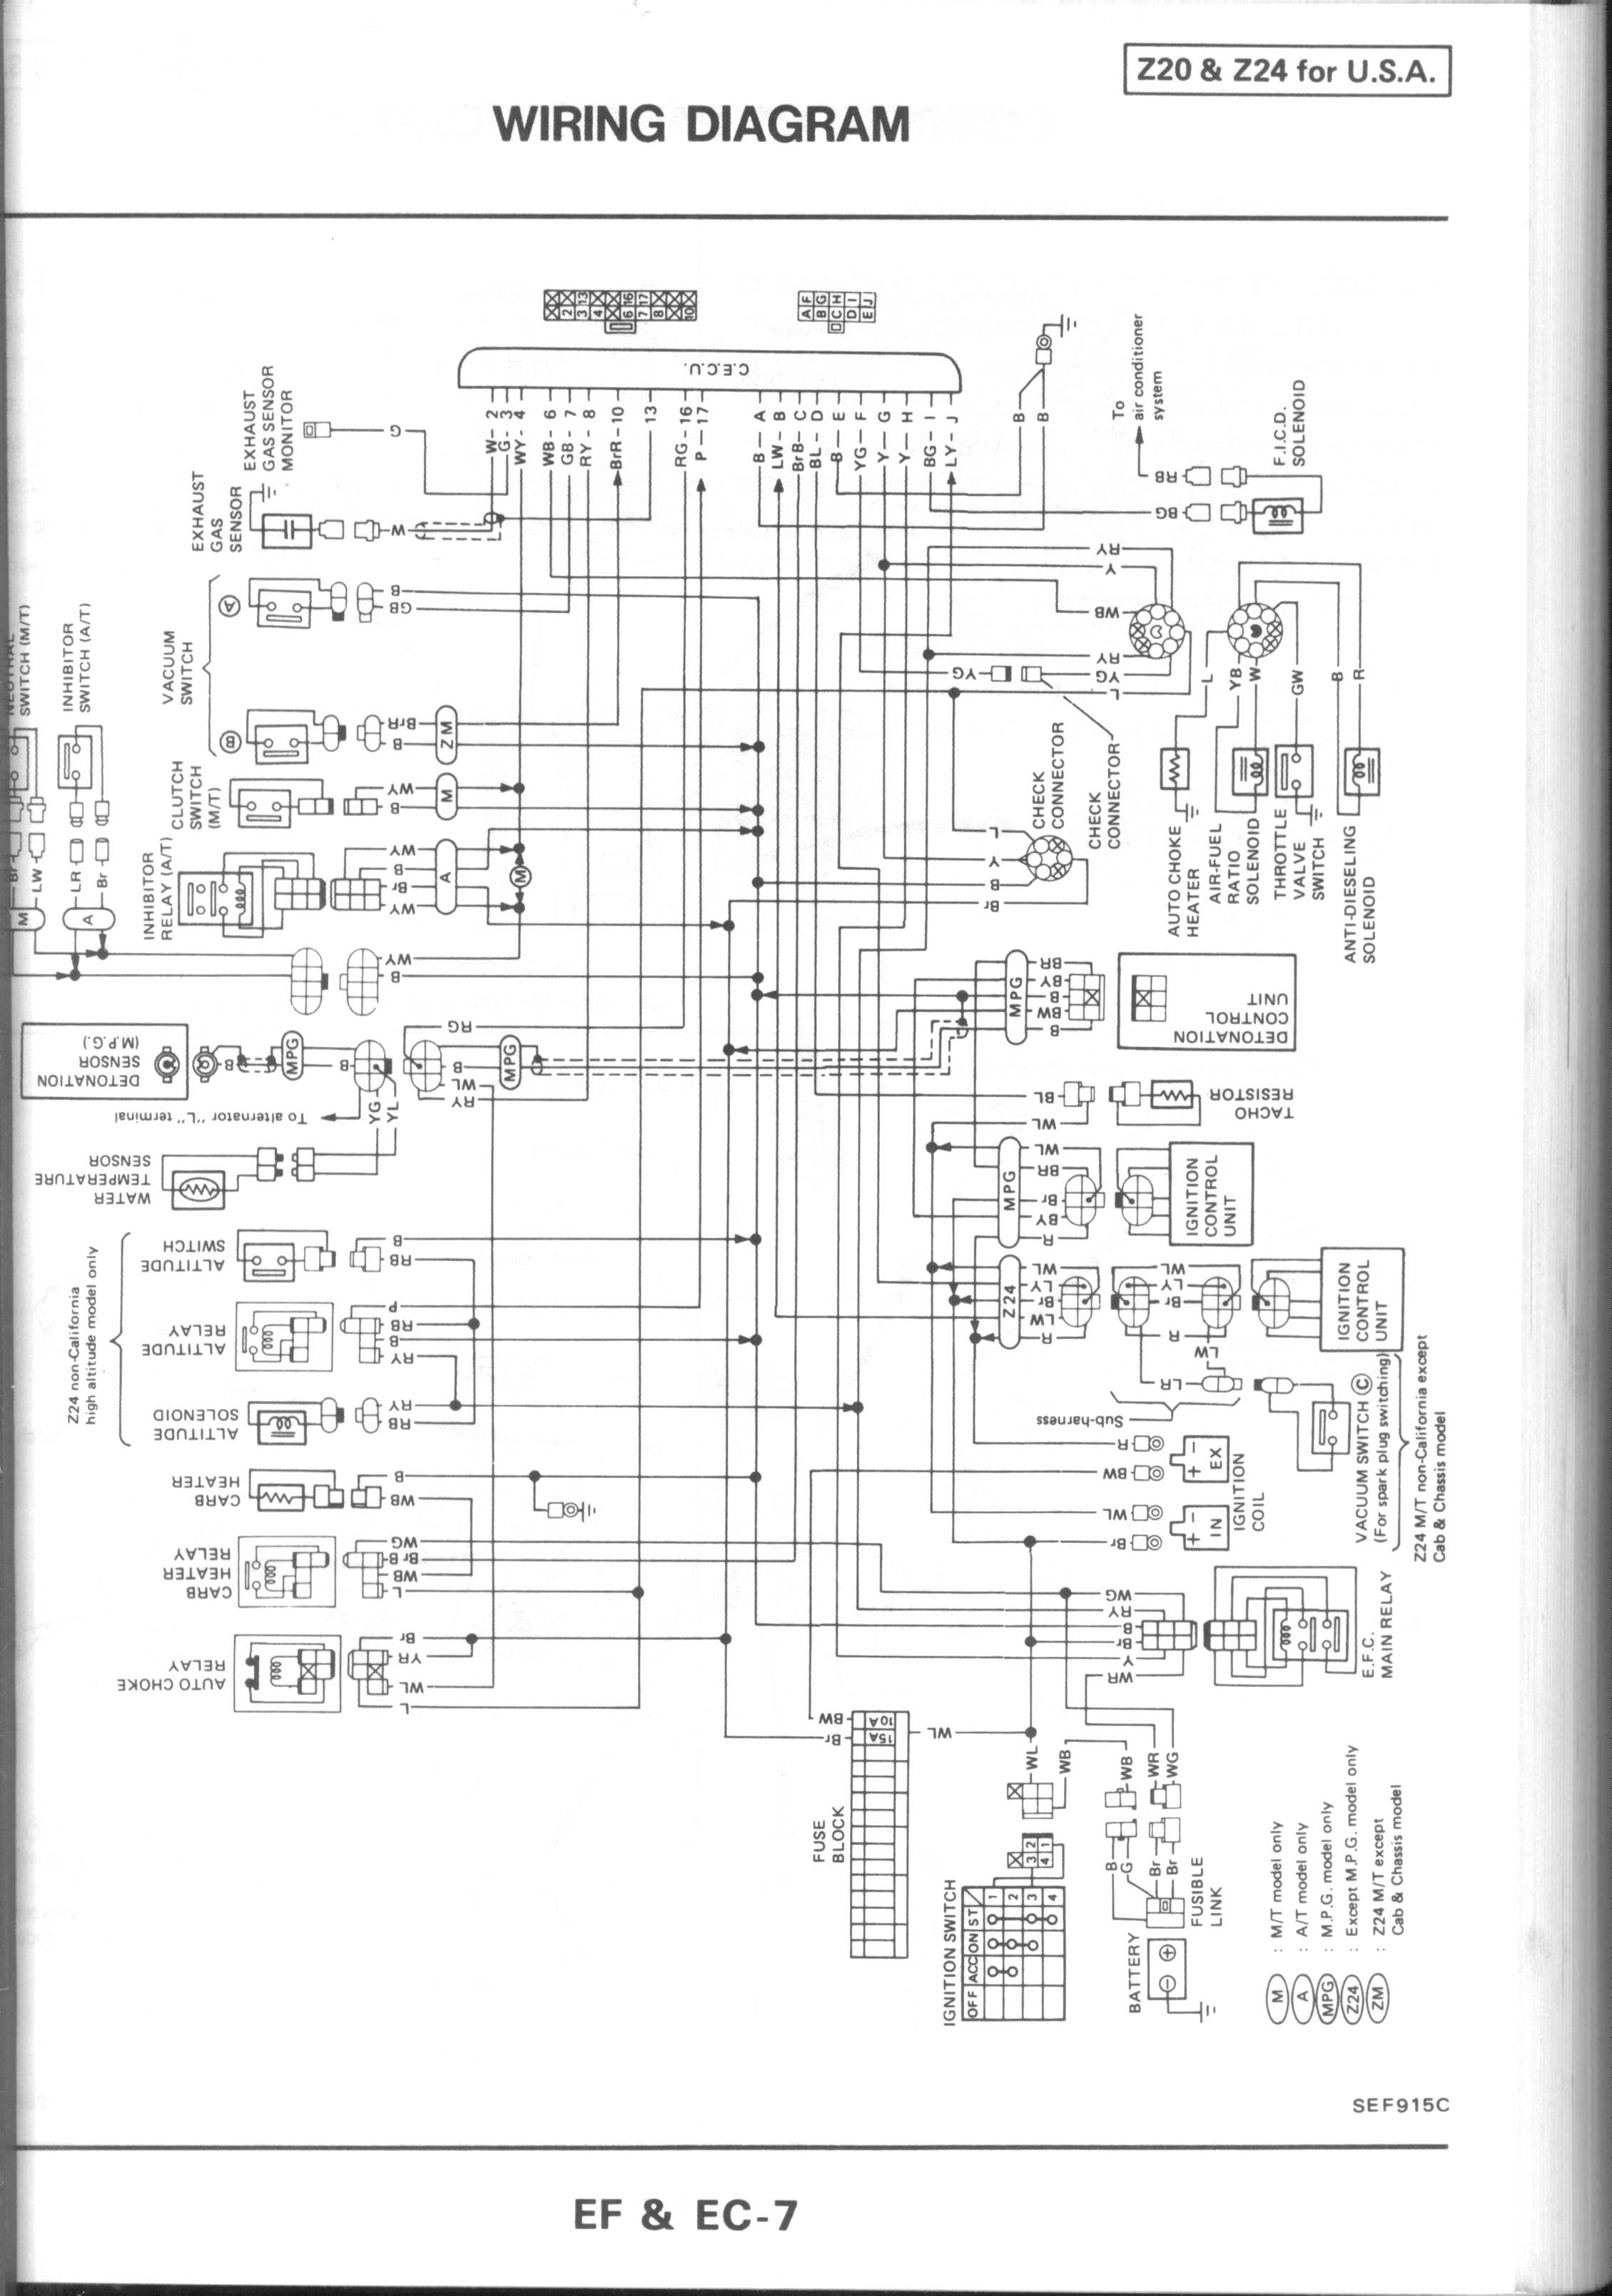 720_z24_ecu_wiring?quality\\\=80\\\&strip\\\=all wiring diagram yamaha golf cart g19et yamaha g1 golf cart repair  at gsmx.co